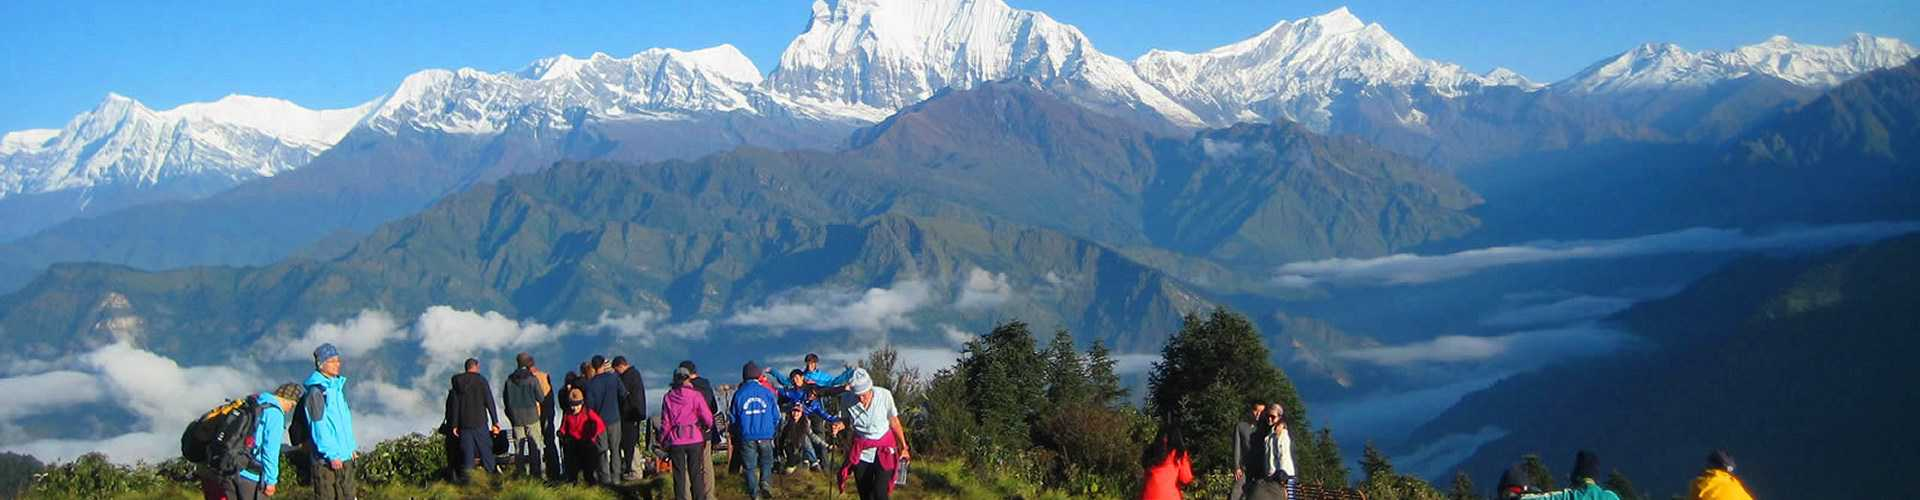 Trekking Reisen, Nepal